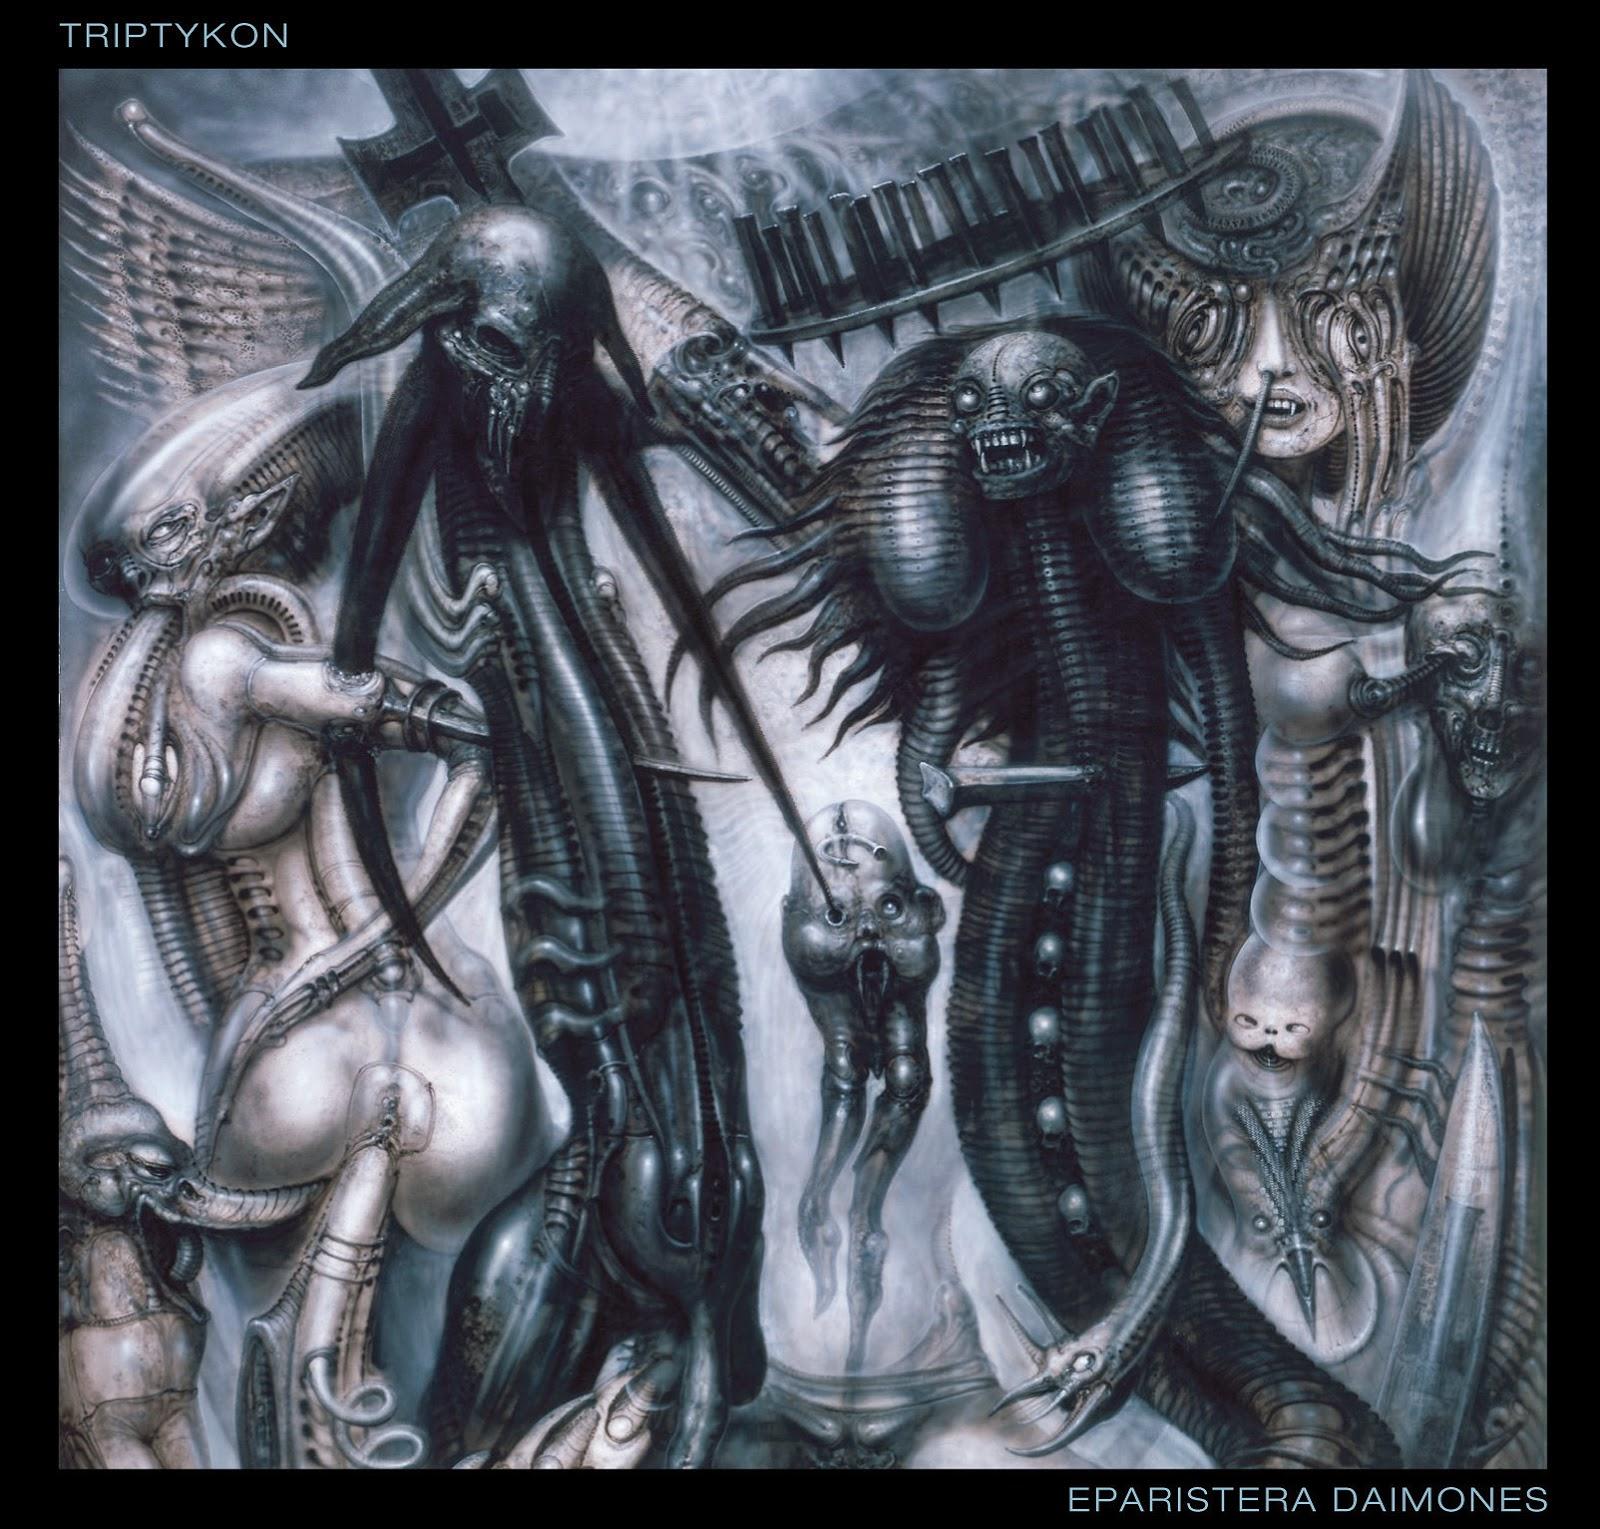 Metal Brutal Argentino Hr Giger Portadas De Discos The Little Things She Needs Malmo Black White Tsn0001342c0256 Hitam 38